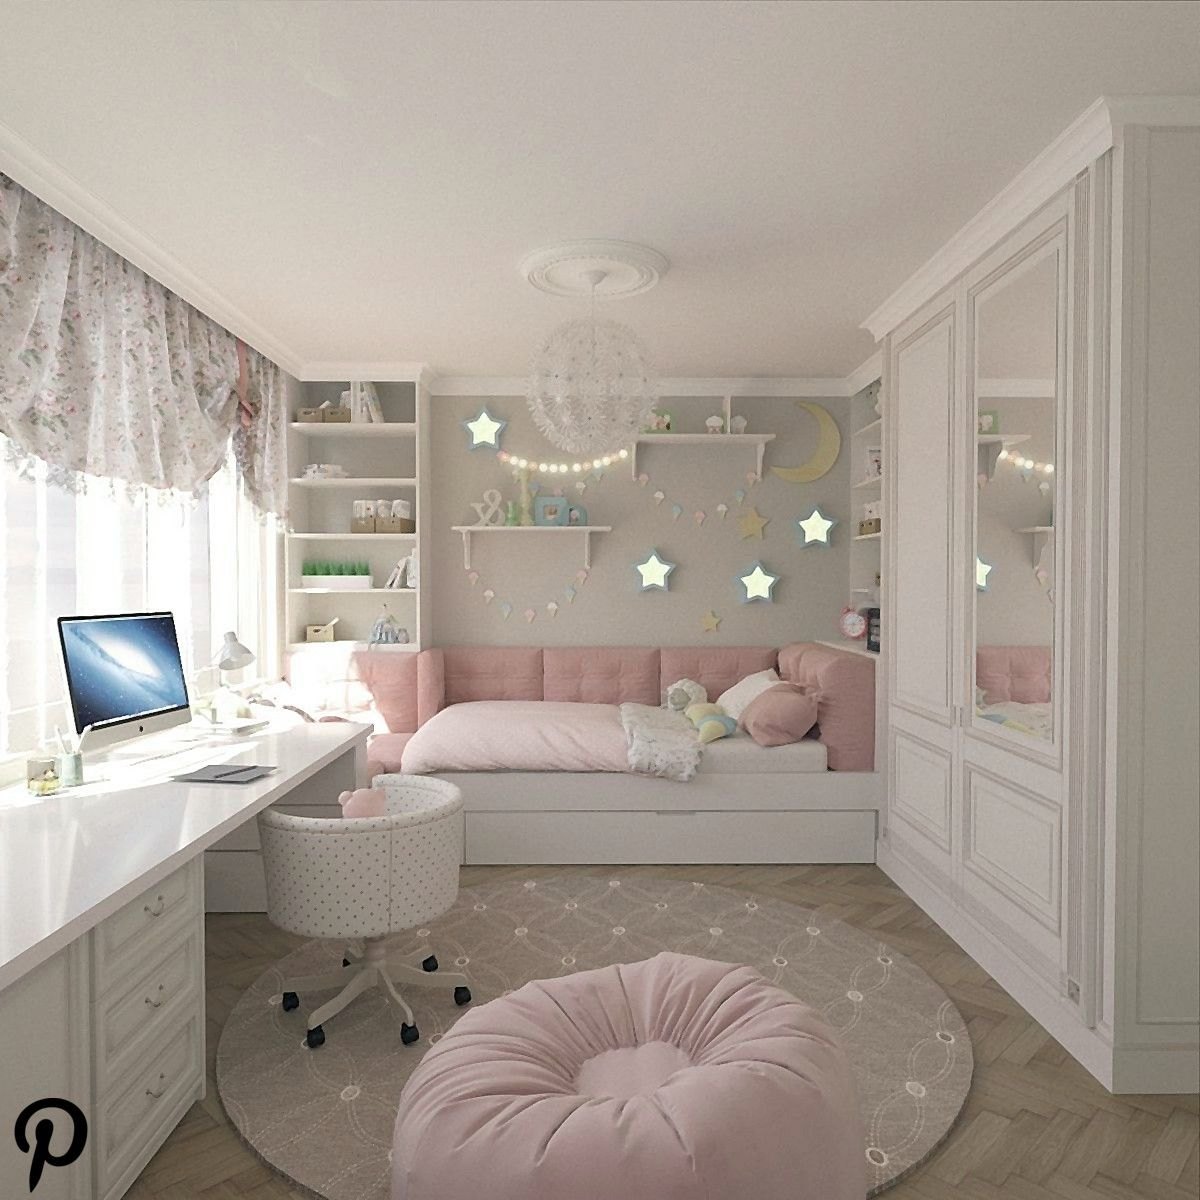 Teenage Girls Bedroom Ideas Schlafzimmer Madchen Madchenzimmer Dekoration Madchenzimmer Teenager